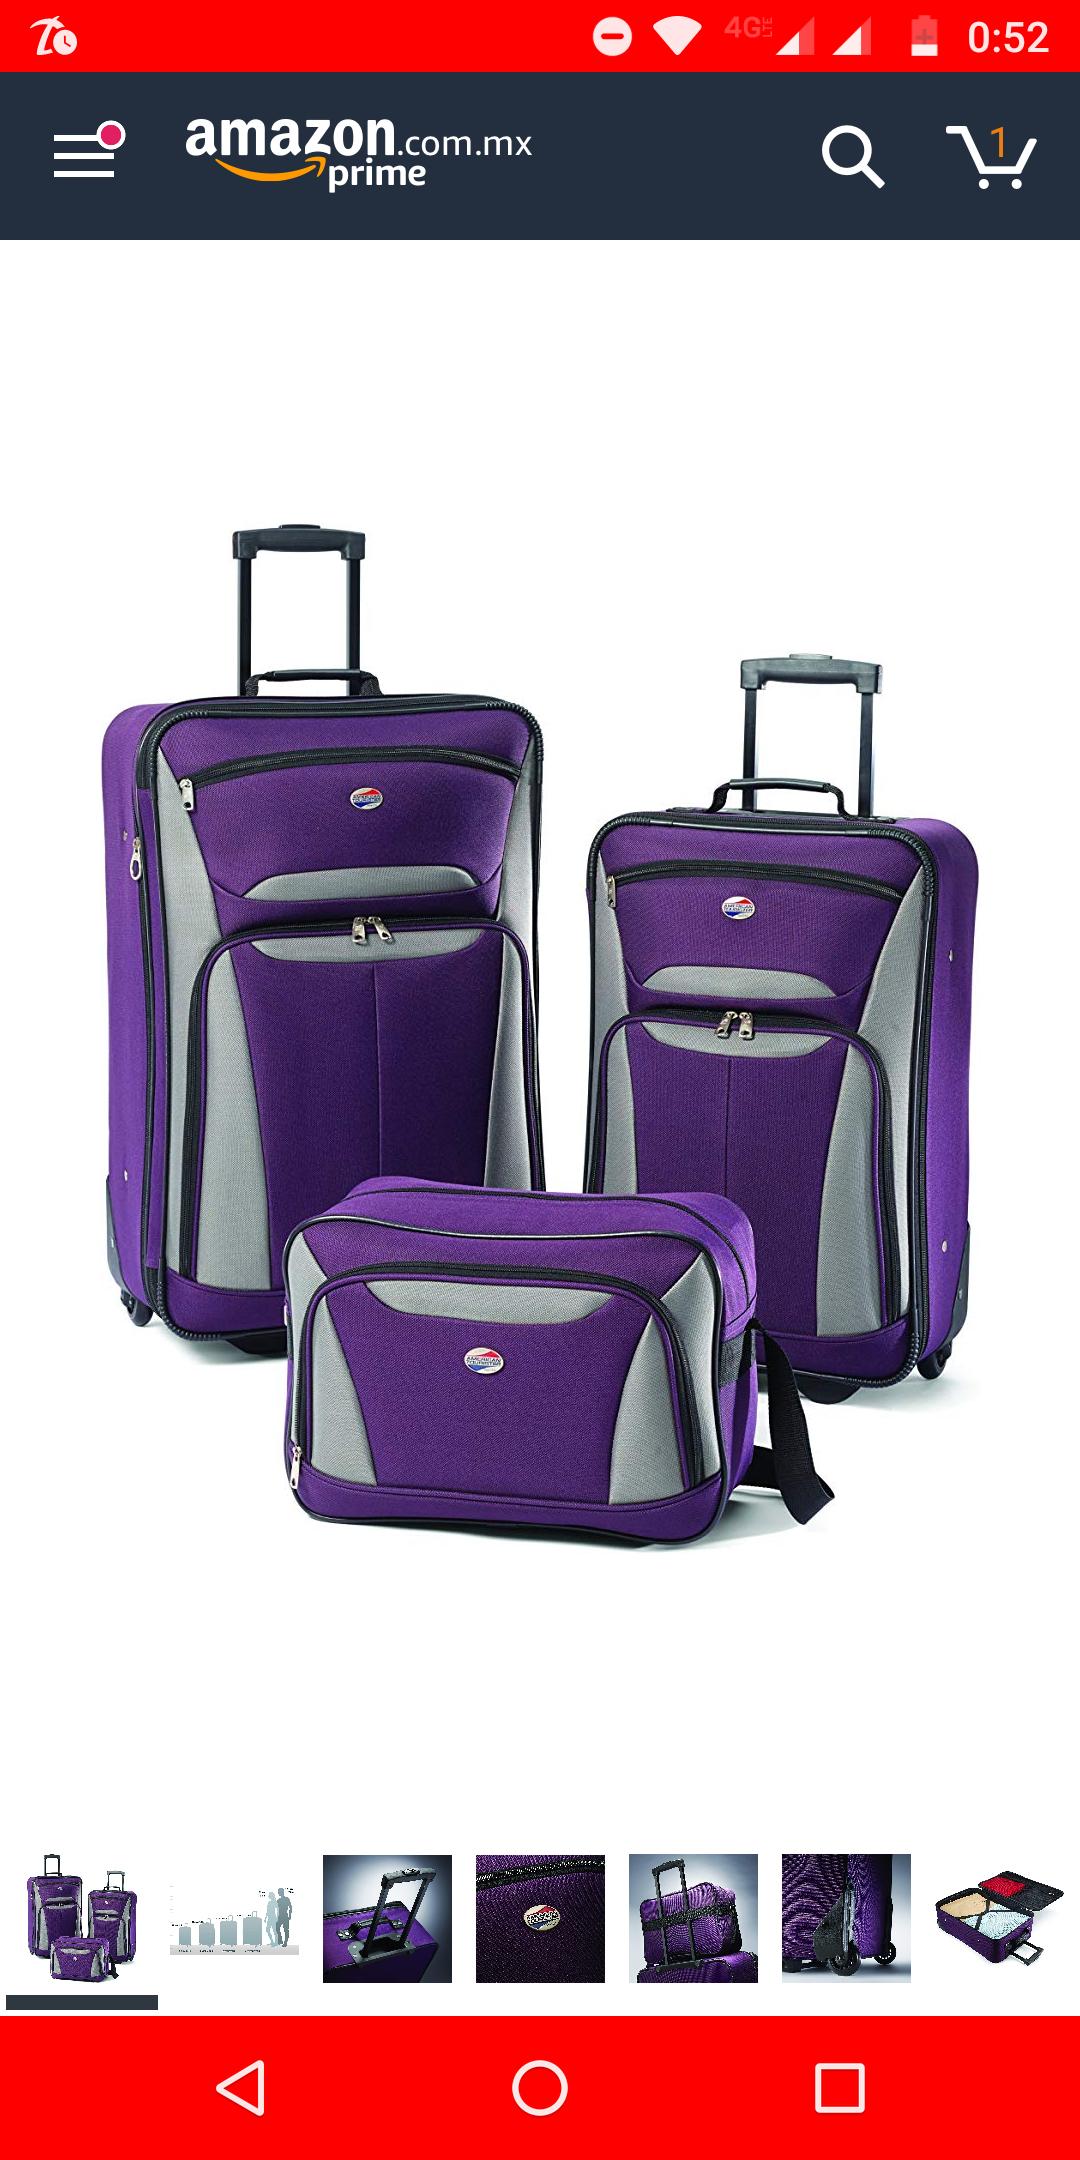 Amazon: Juego de 3 maletas color púrpura